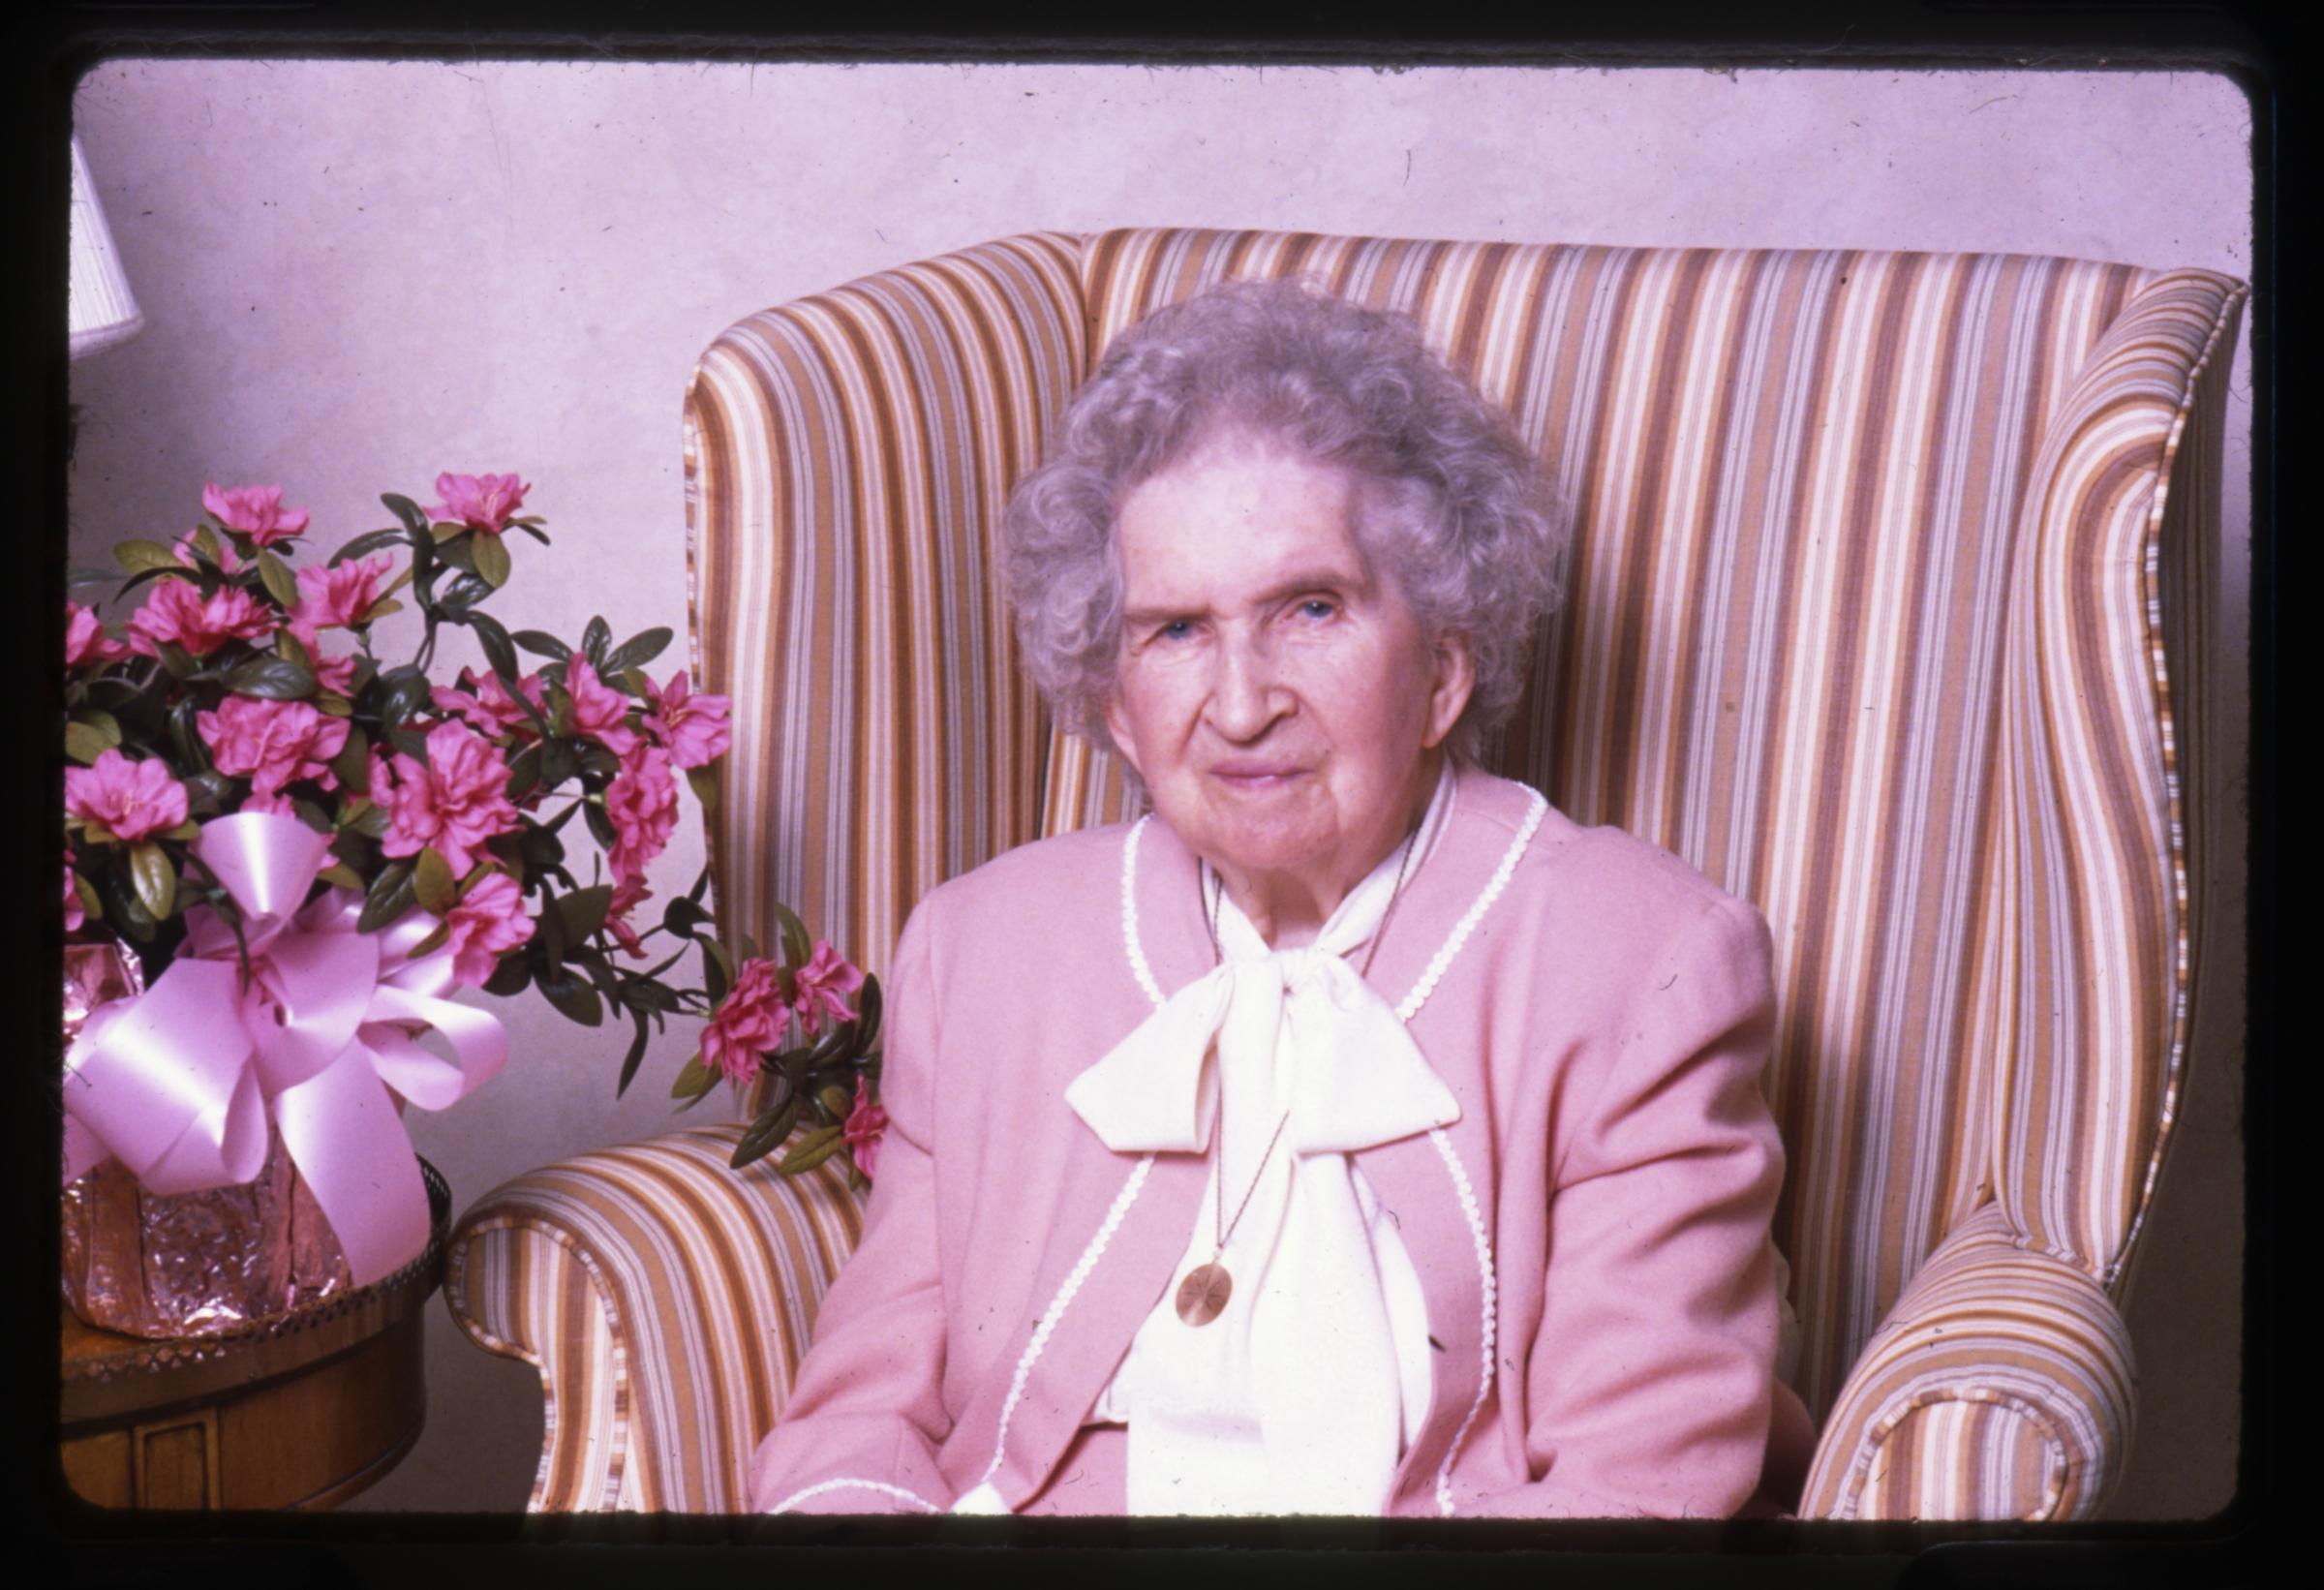 Sister Flora Smith Amussen Benson, wife of President Ezra Taft Benson, posed for a photo on her 88th birthday in 1989.